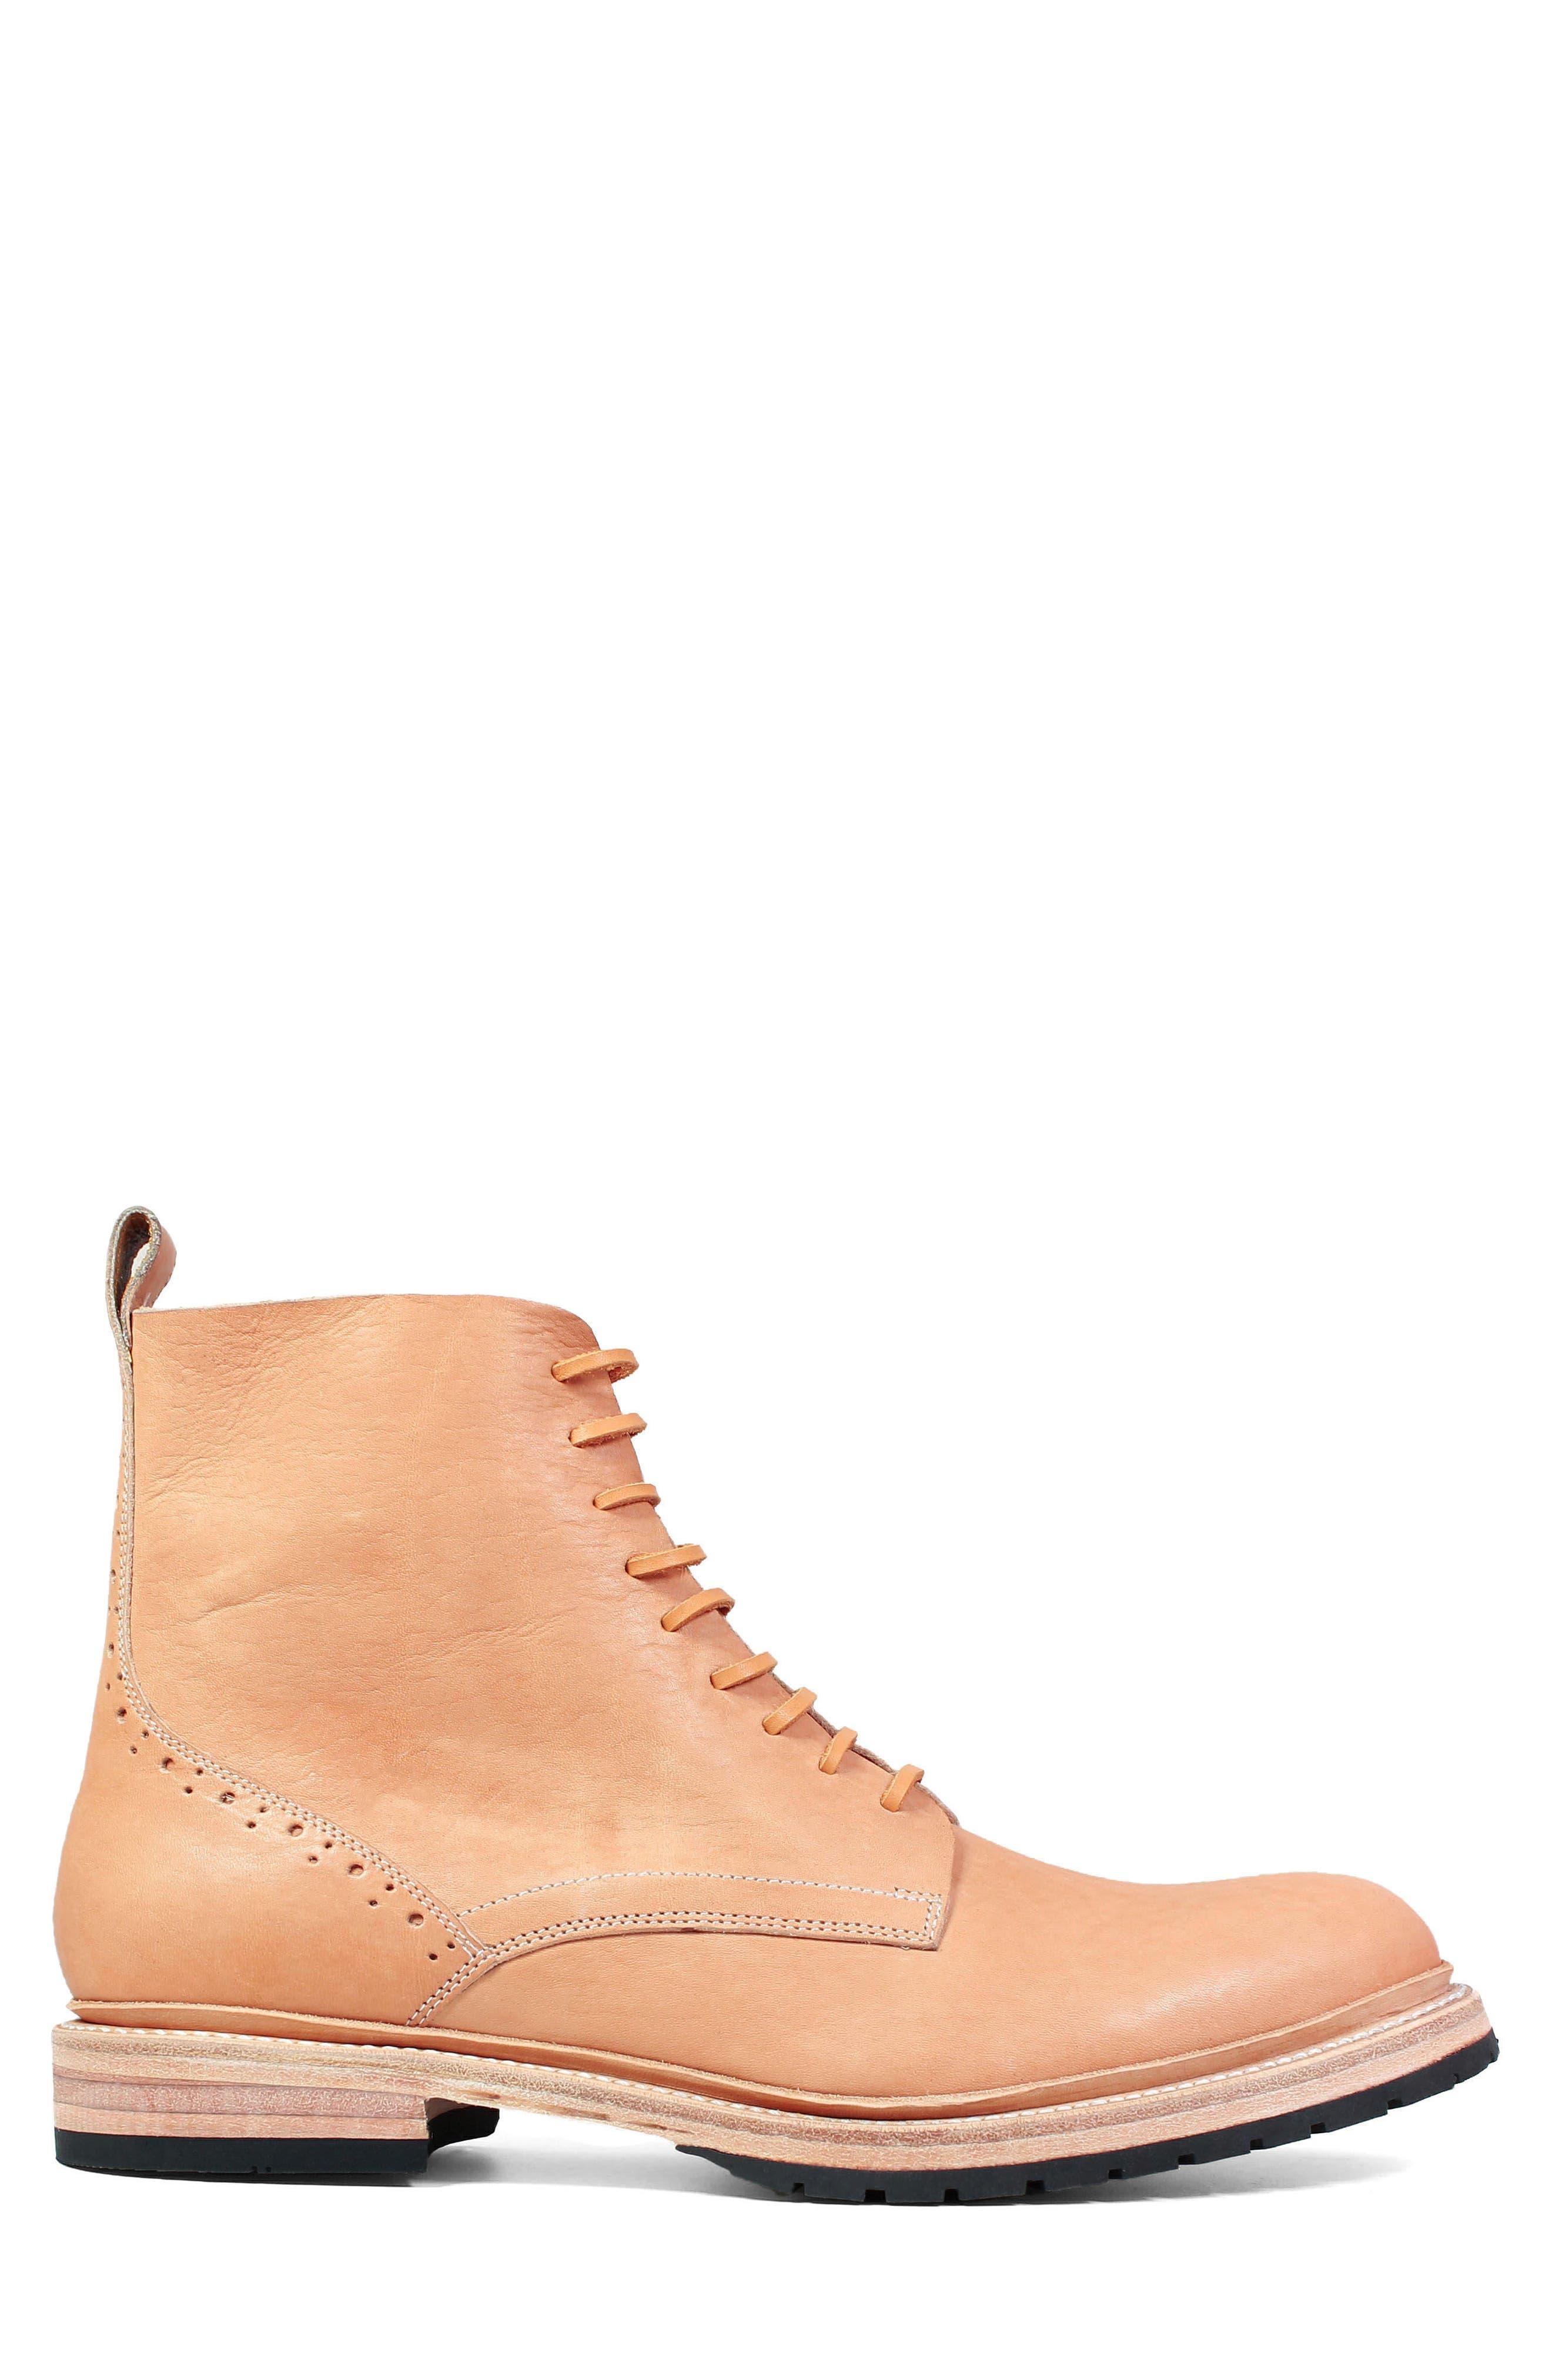 M2 Plain Toe Boot,                             Alternate thumbnail 3, color,                             Natural Leather